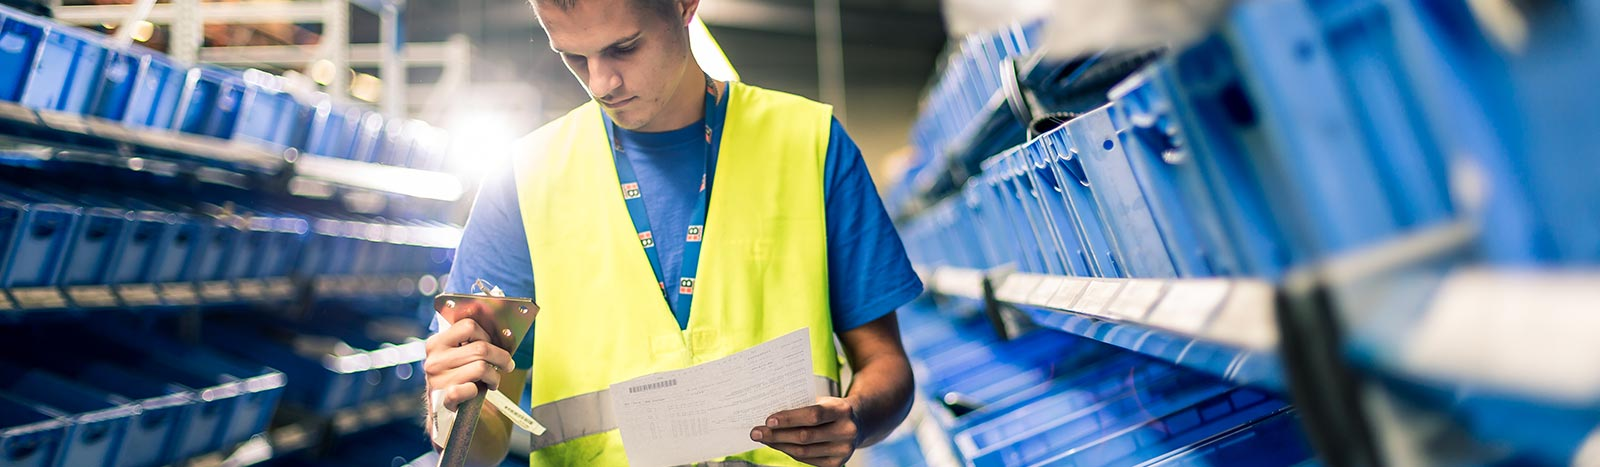 isl-logistics-pay-on-production-2-kl